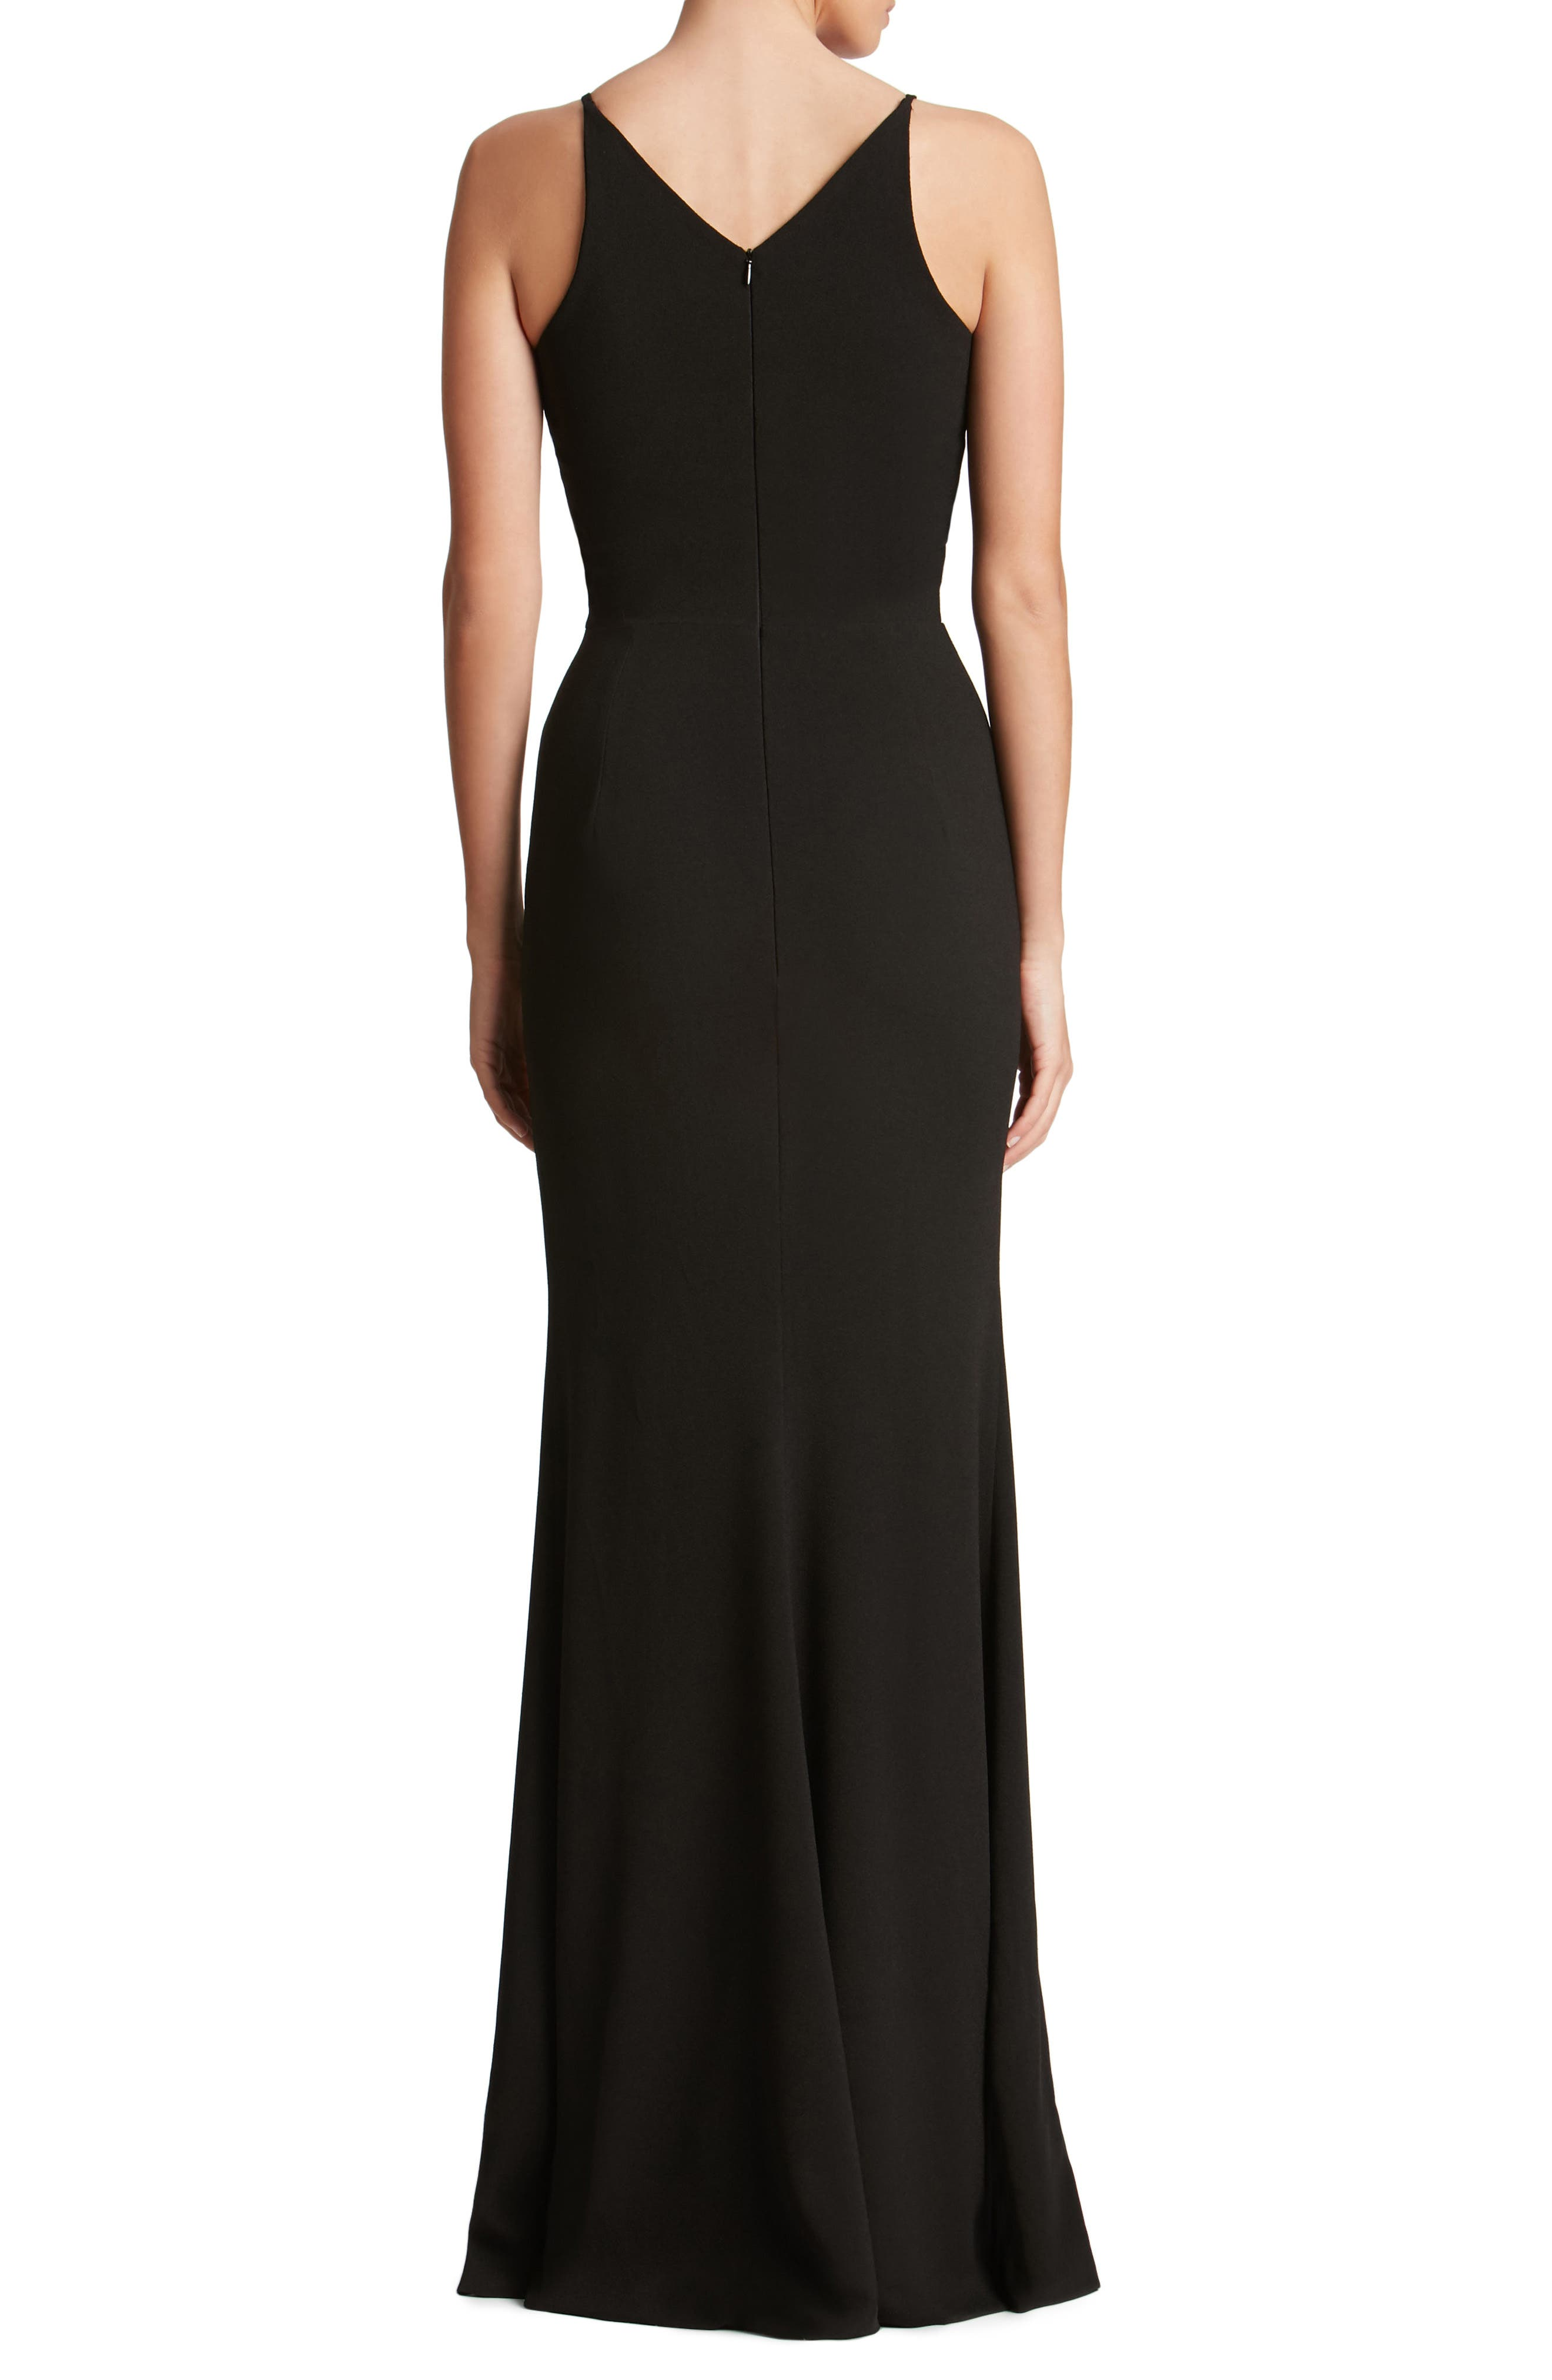 DRESS THE POPULATION, Iris Slit Crepe Gown, Alternate thumbnail 2, color, BLACK